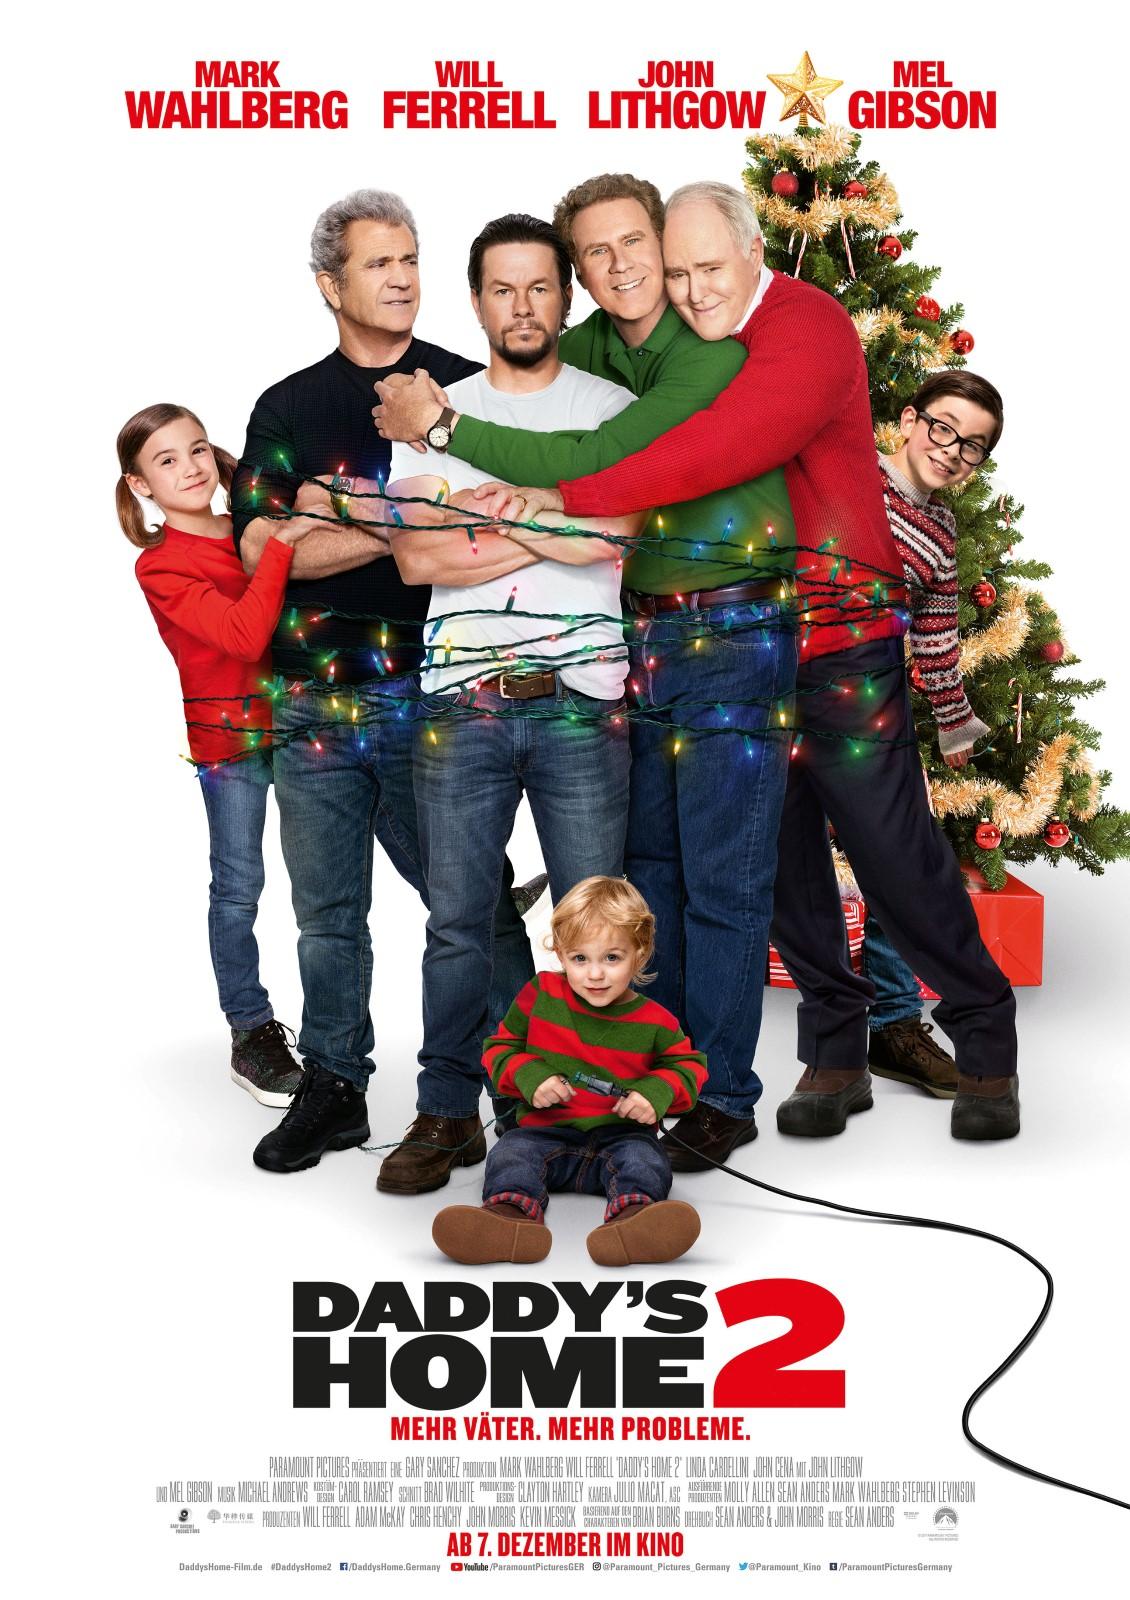 DaddyS Home 2 Cda